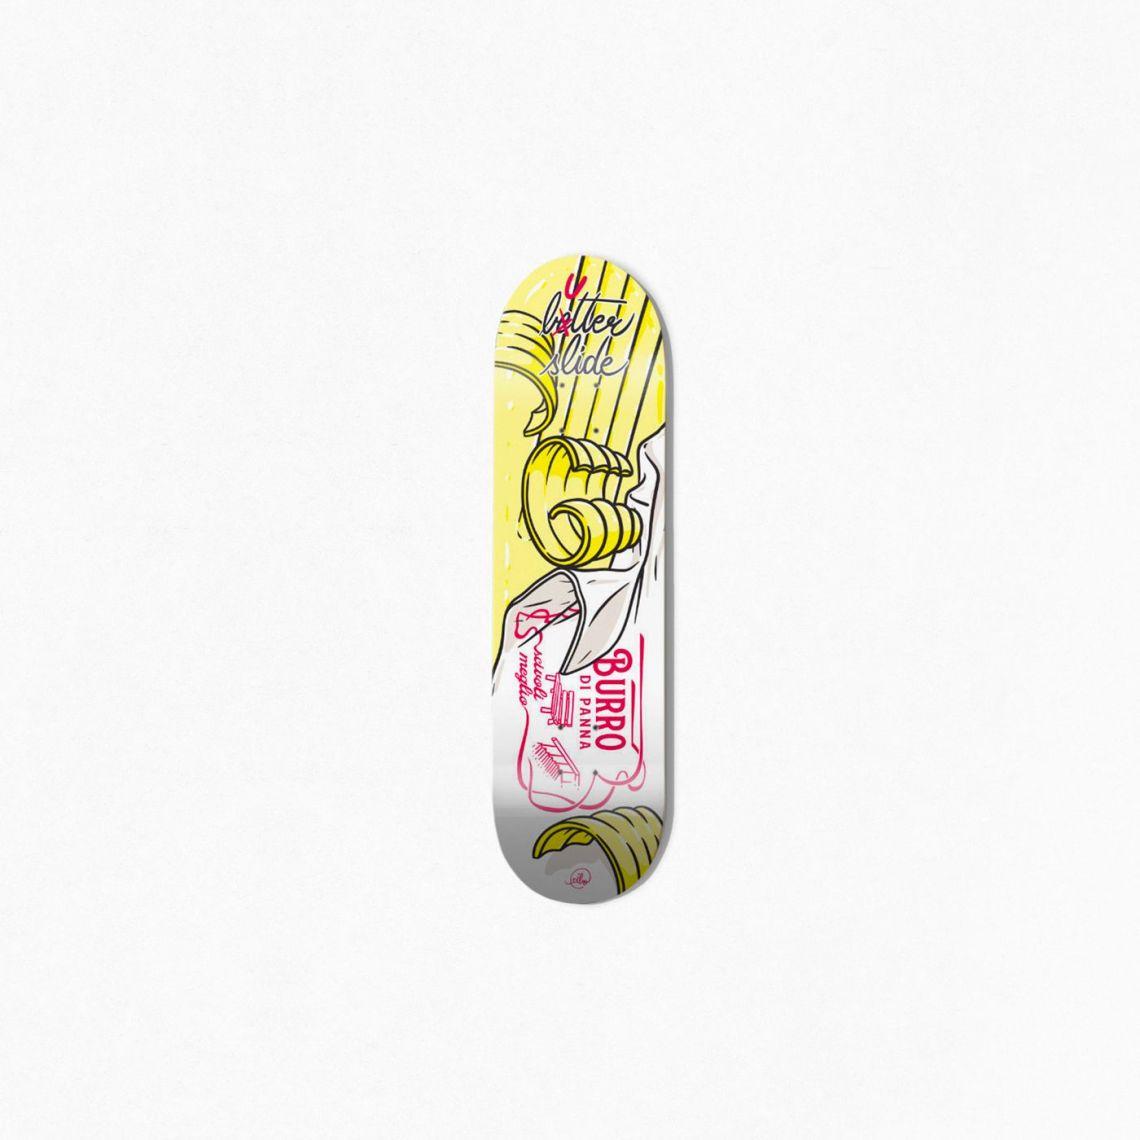 Burro Di Panna Skateboard By Cibo For Bonobolabo 2